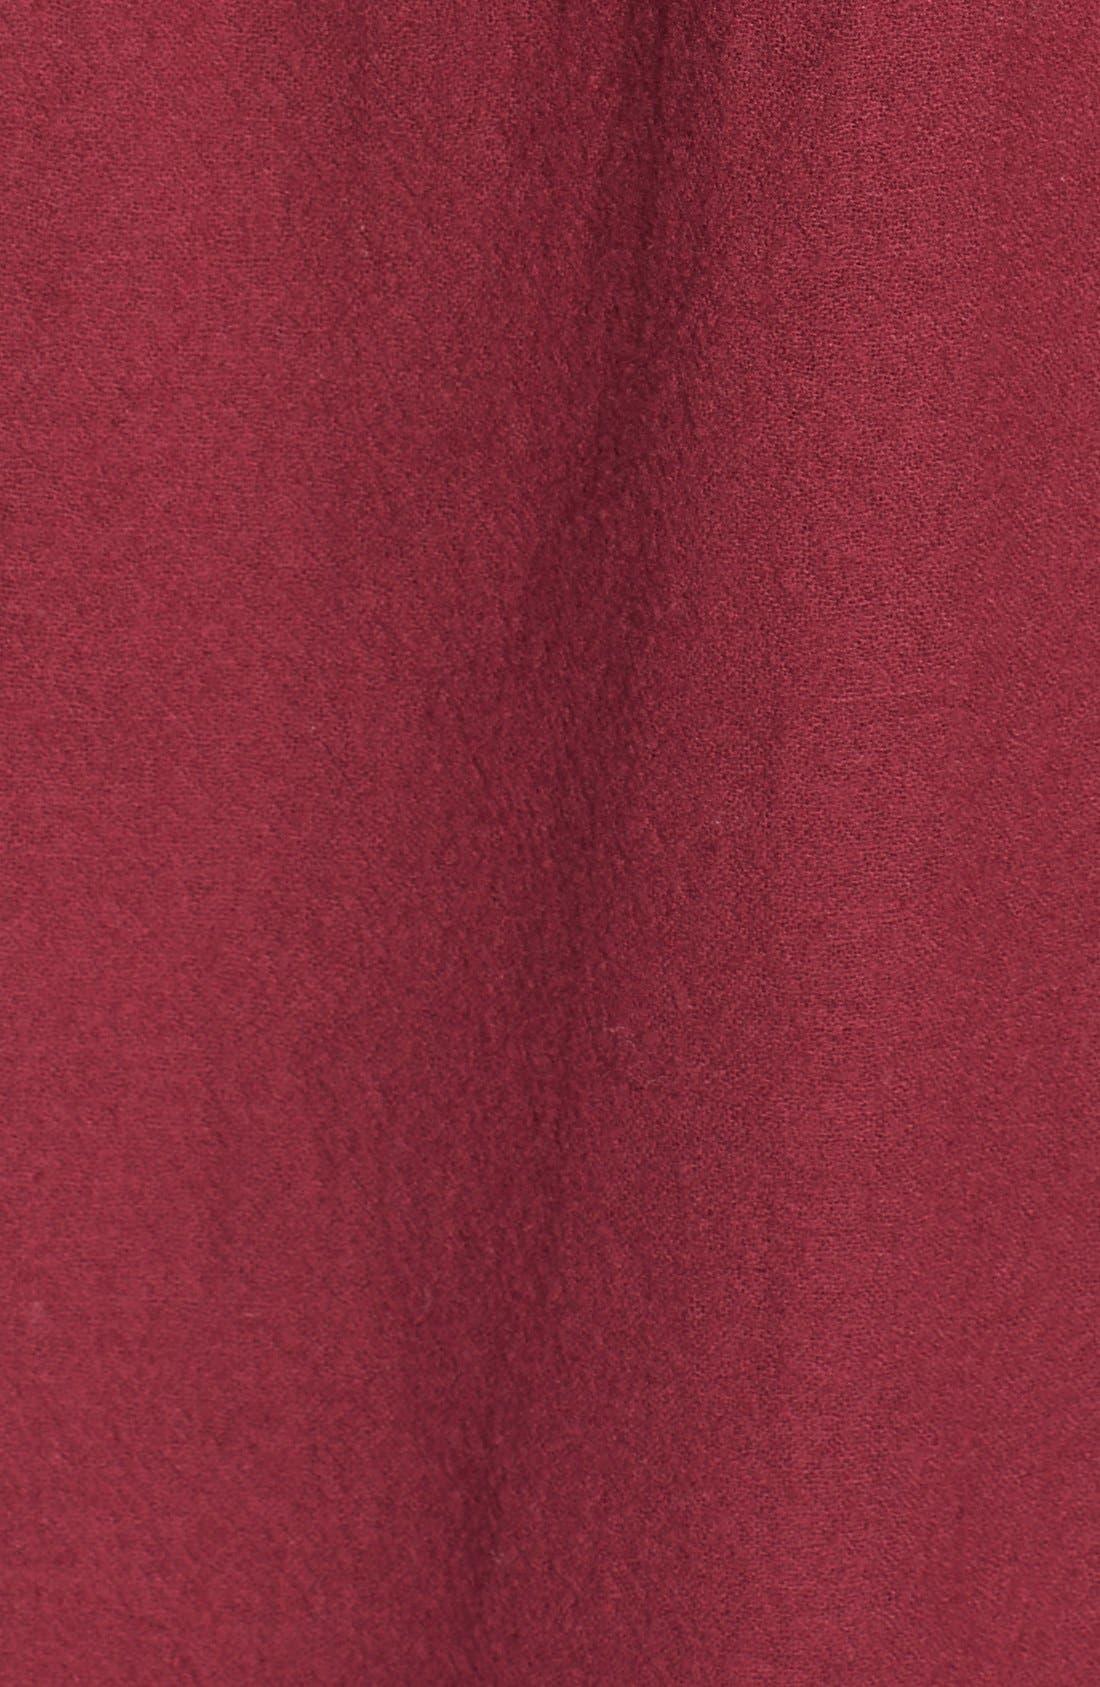 Cape Dress,                             Alternate thumbnail 3, color,                             601